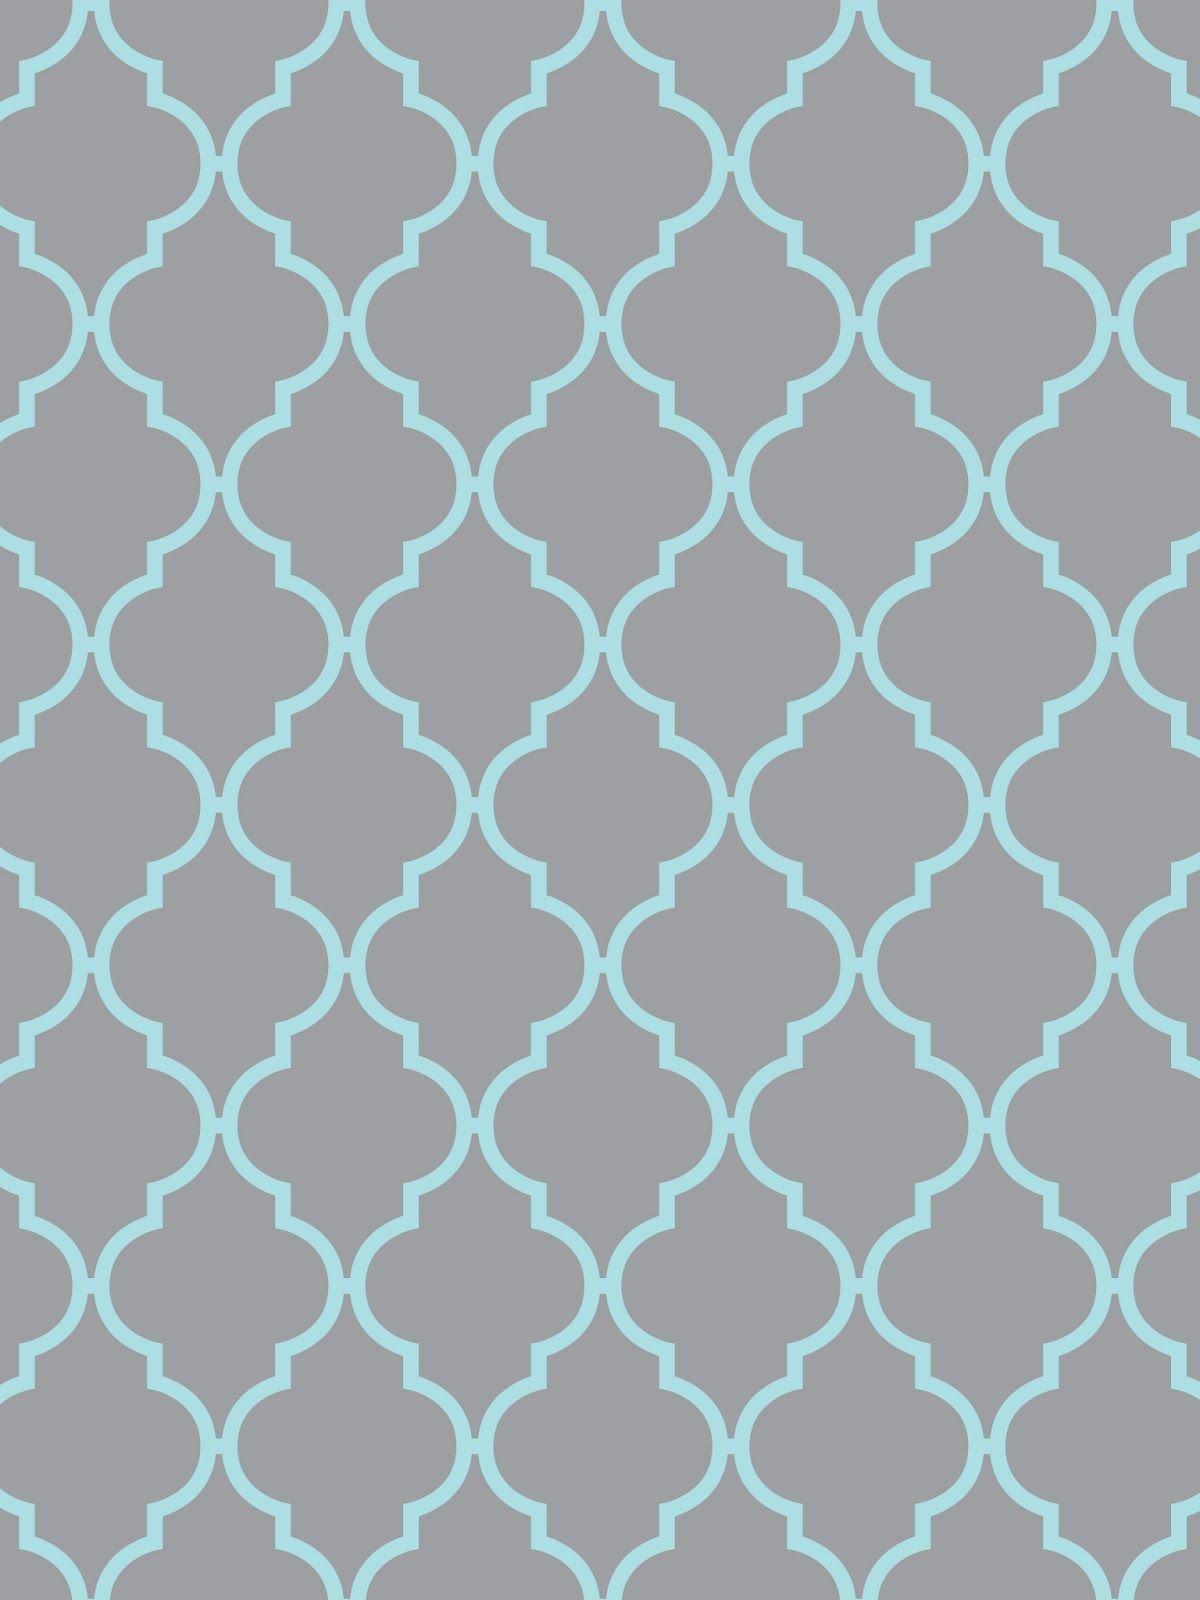 Make itCreate Printables BackgroundsWallpapers Quatrefoil